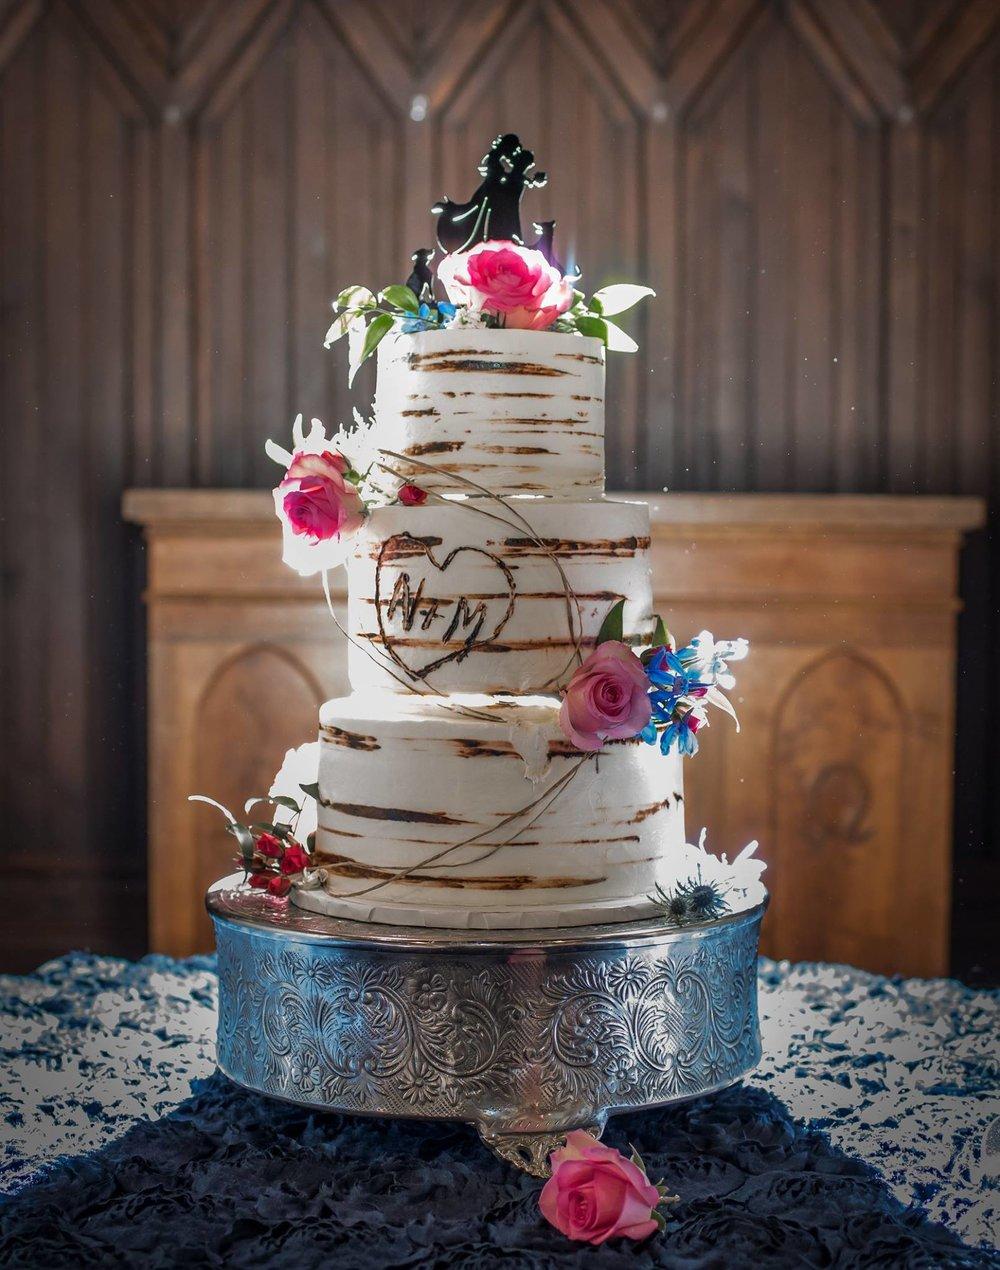 Wedding Cake in Raleigh NC.jpg